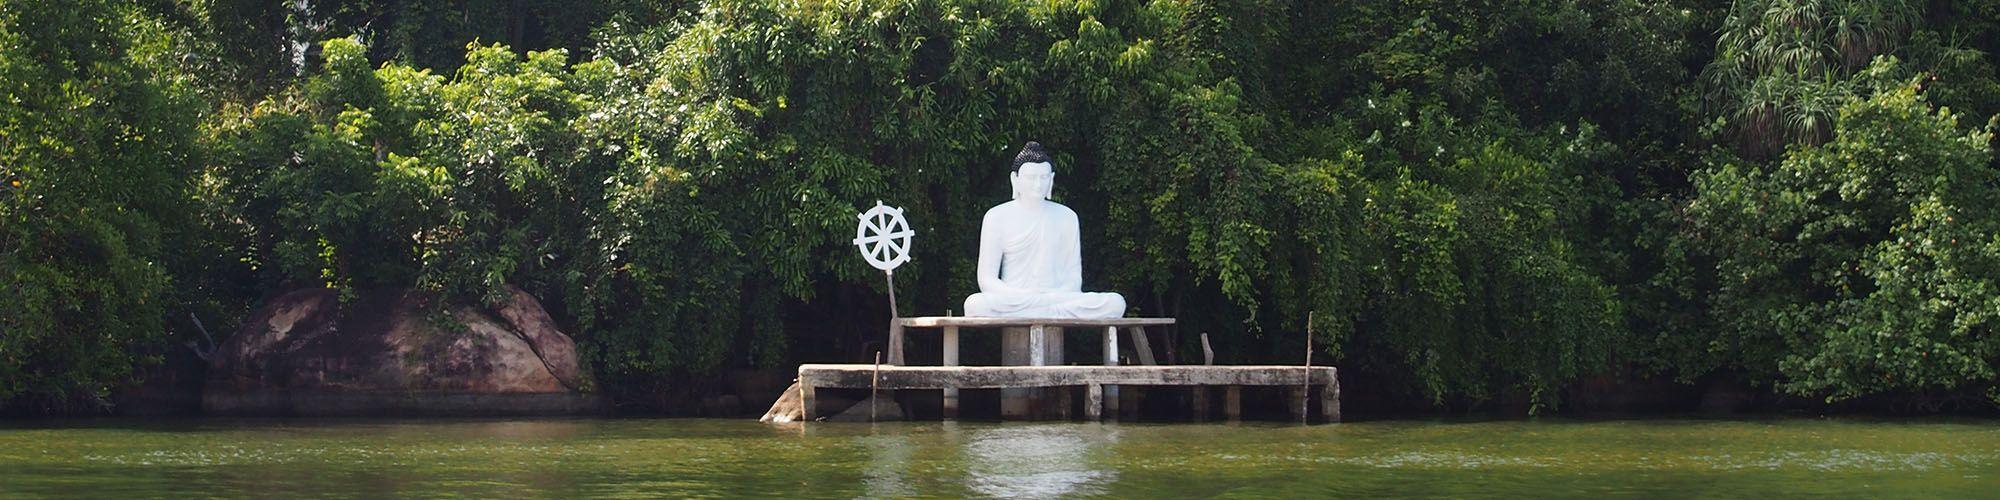 Sri Lanka, Madu Ganga, Buddha